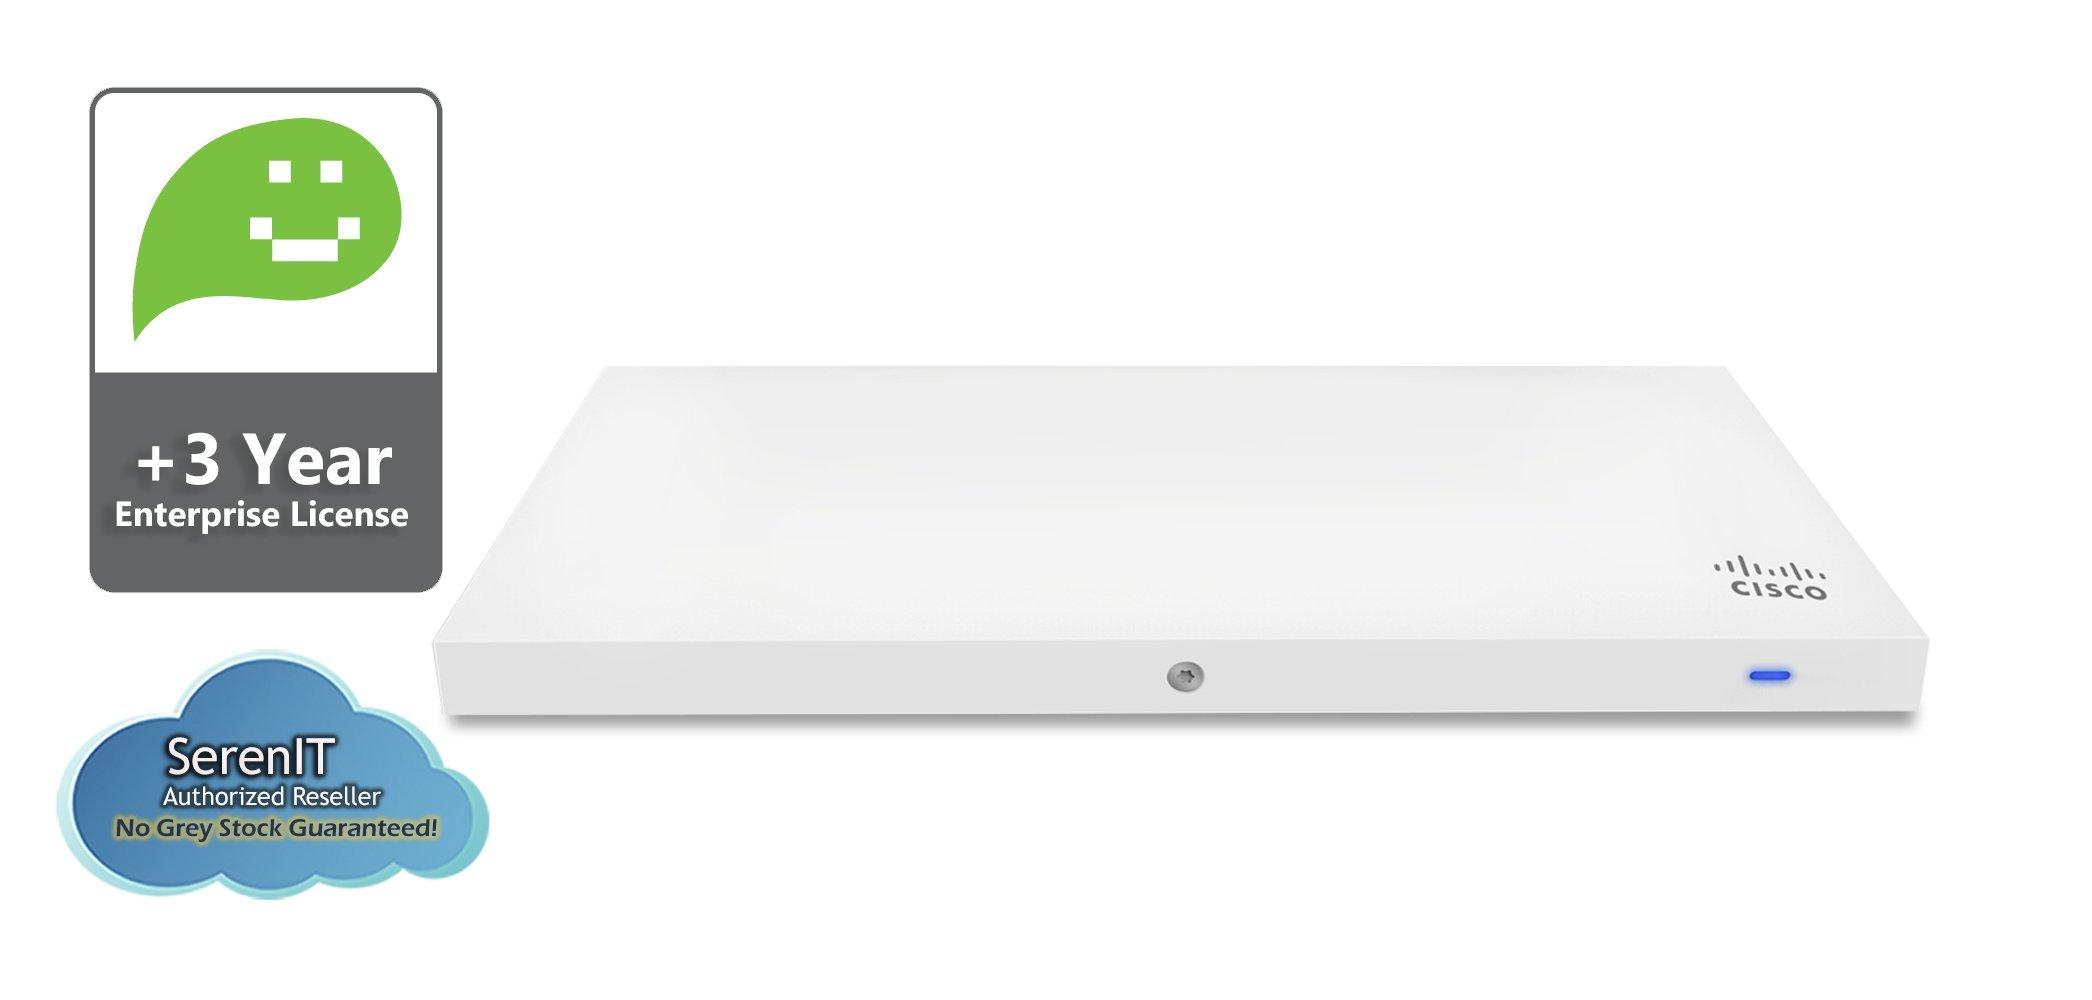 Cisco Meraki MR33 Quad-Radio 802.11ac Wave 2 Access Point, 1.3 Gbps, 802.3af PoE with 3 Years Enterprise License